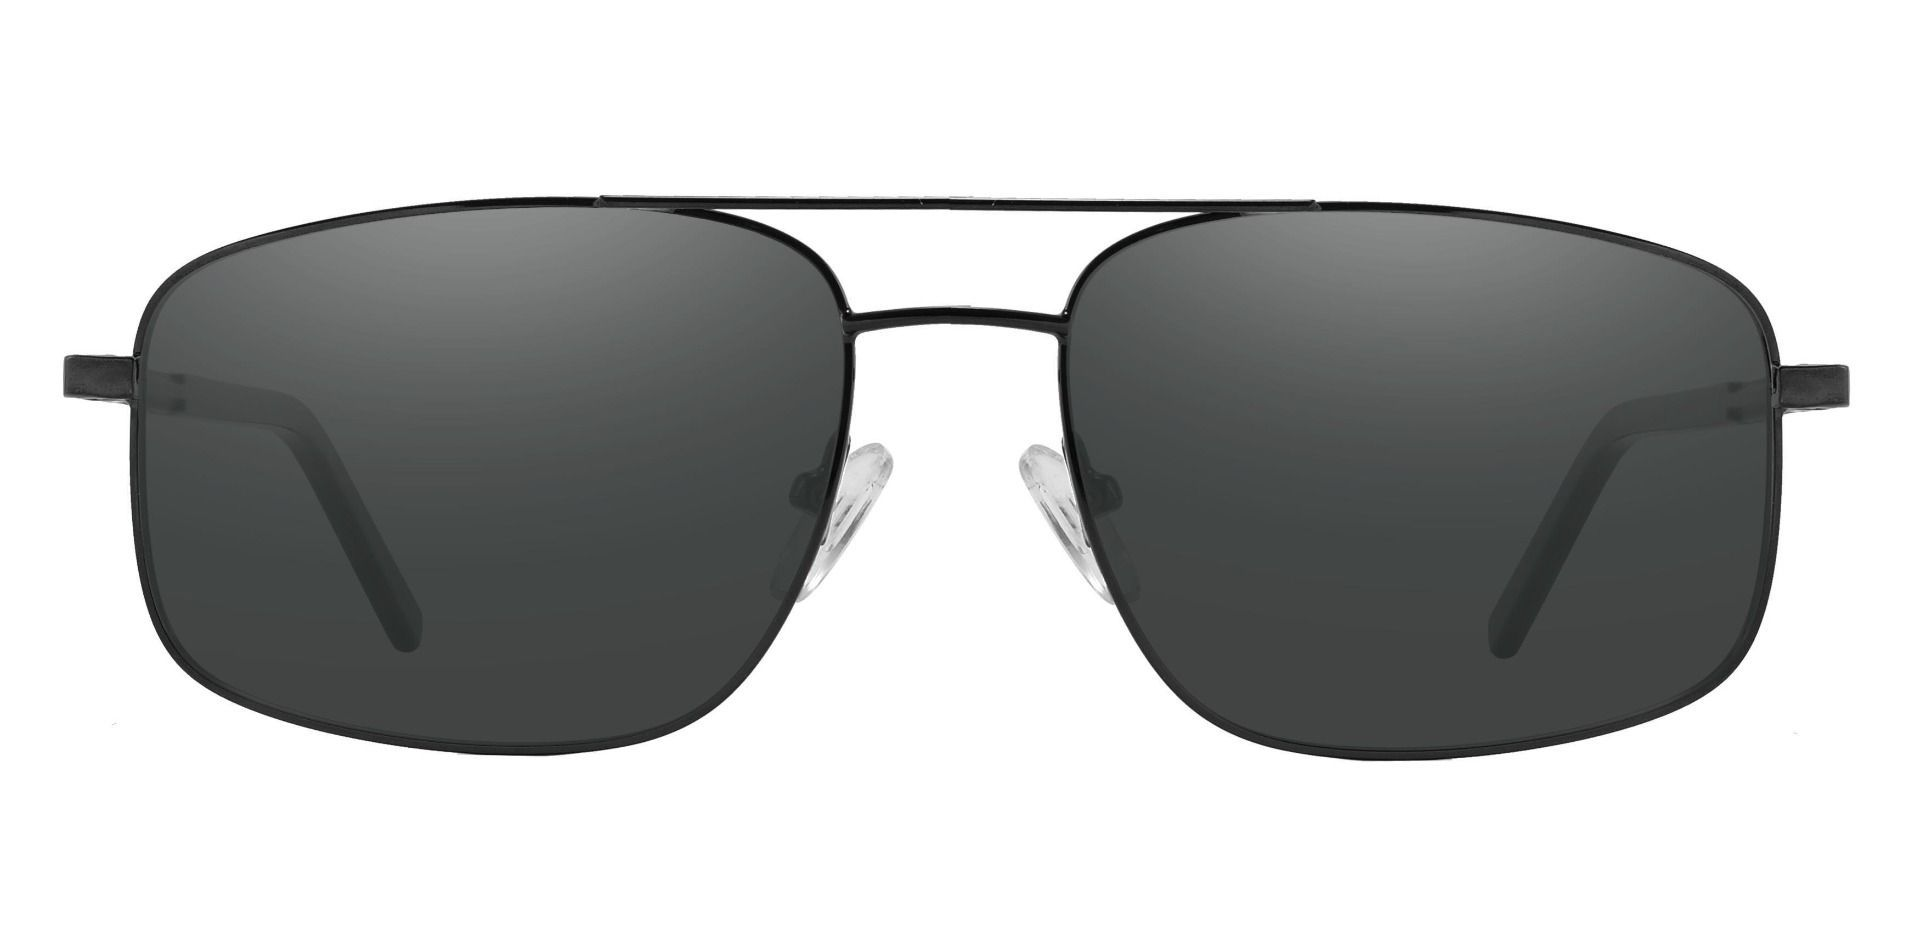 Davenport Aviator Prescription Sunglasses - Black Frame With Gray Lenses